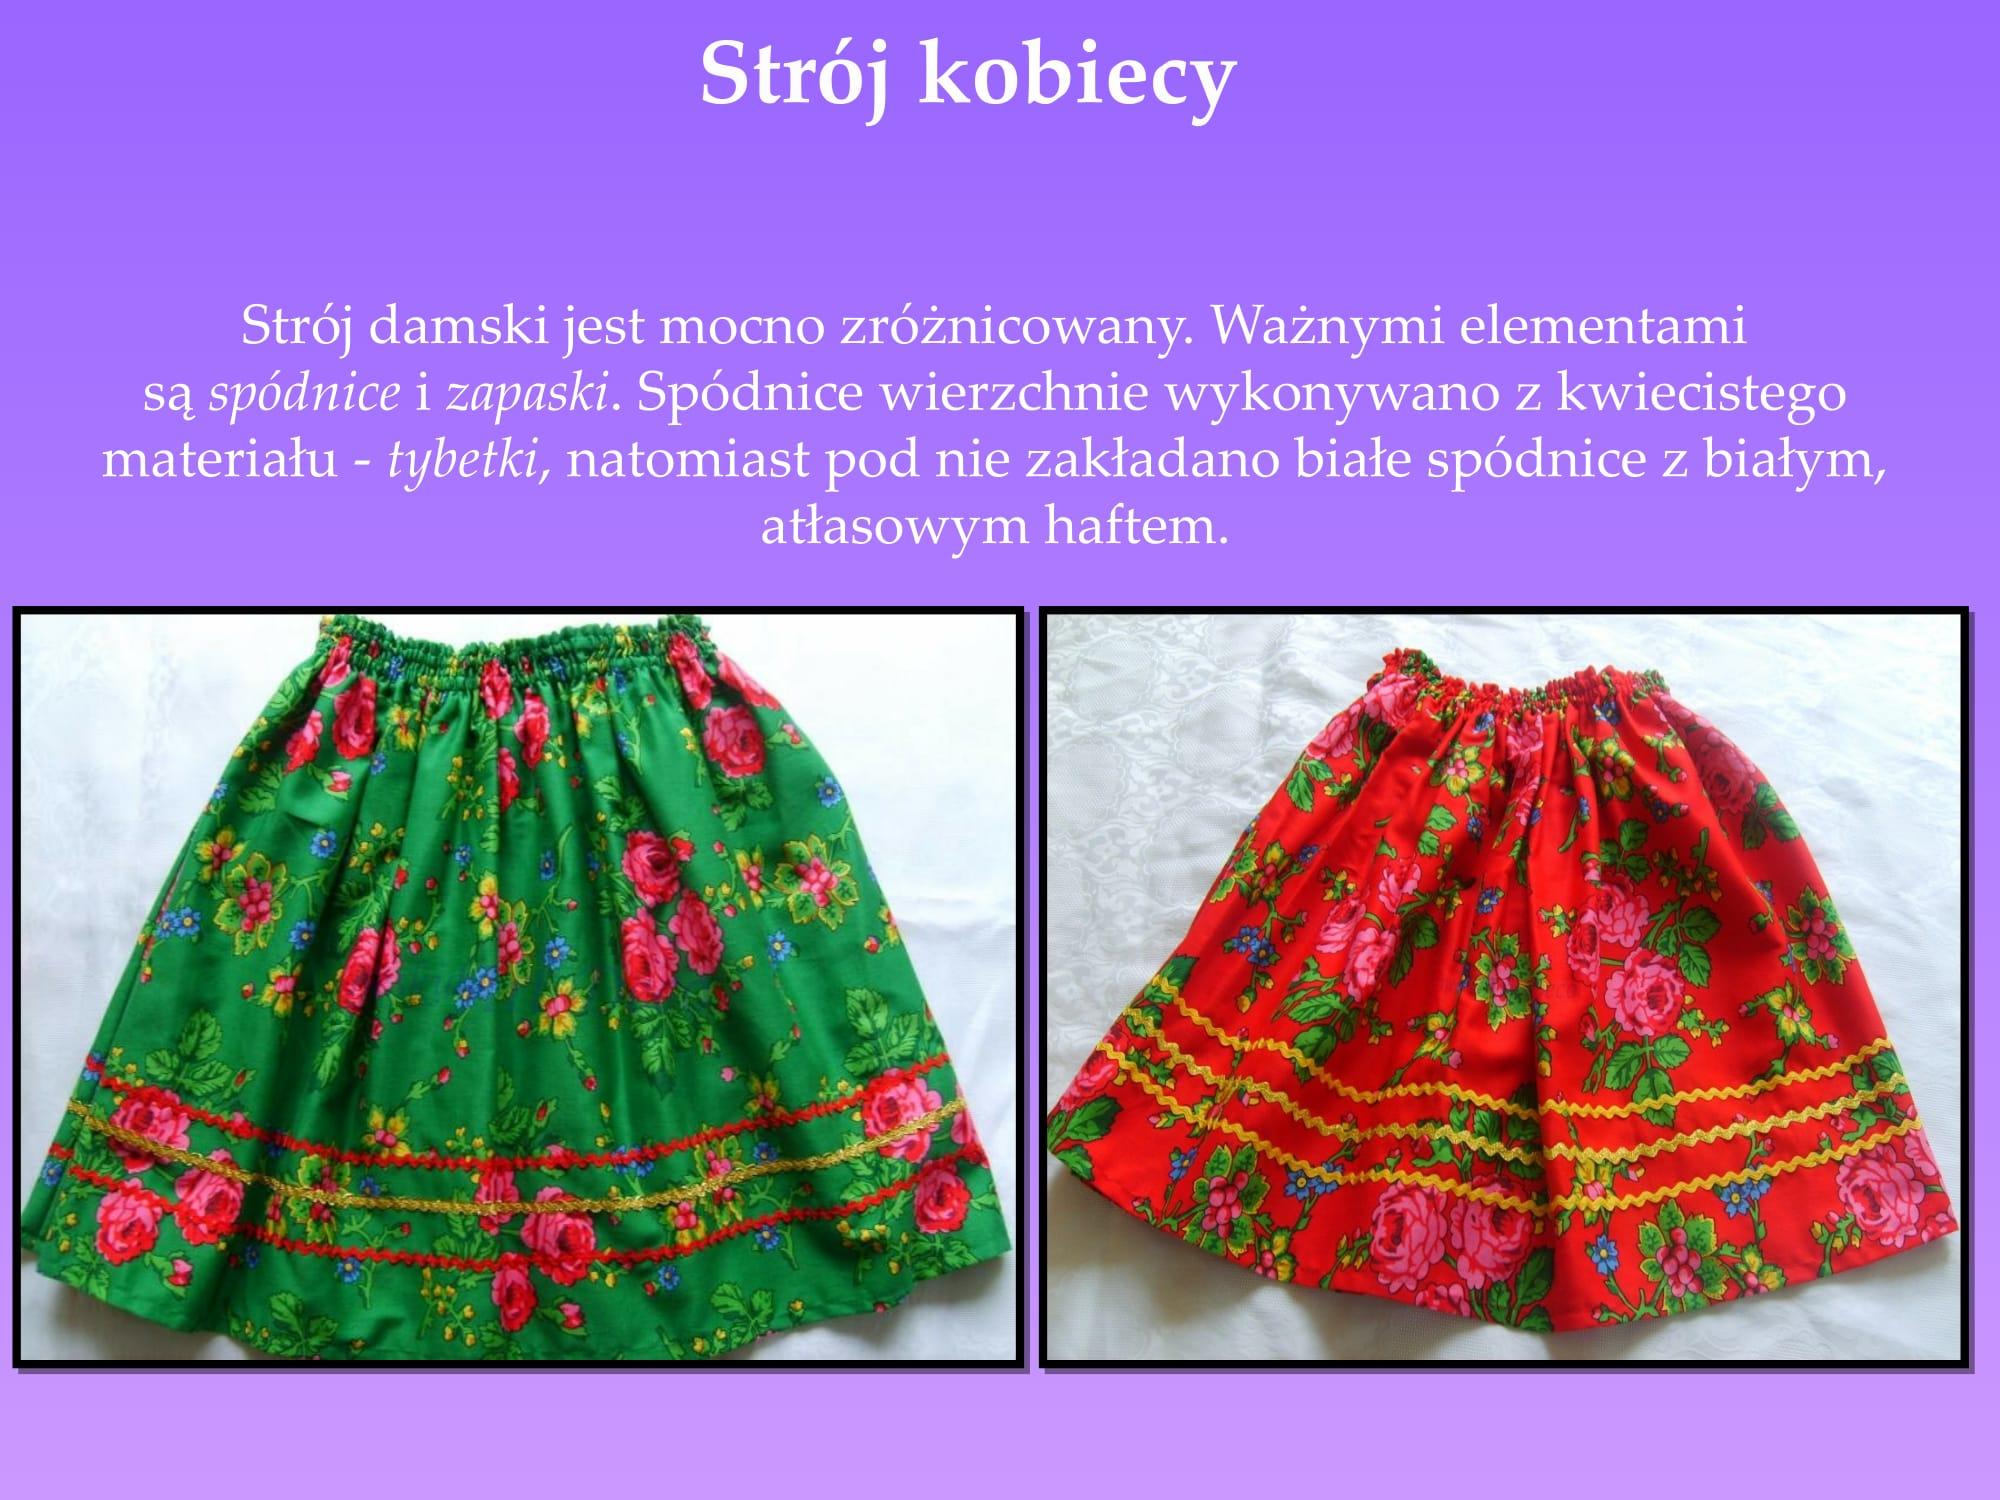 stroj-krakowski-strona-15